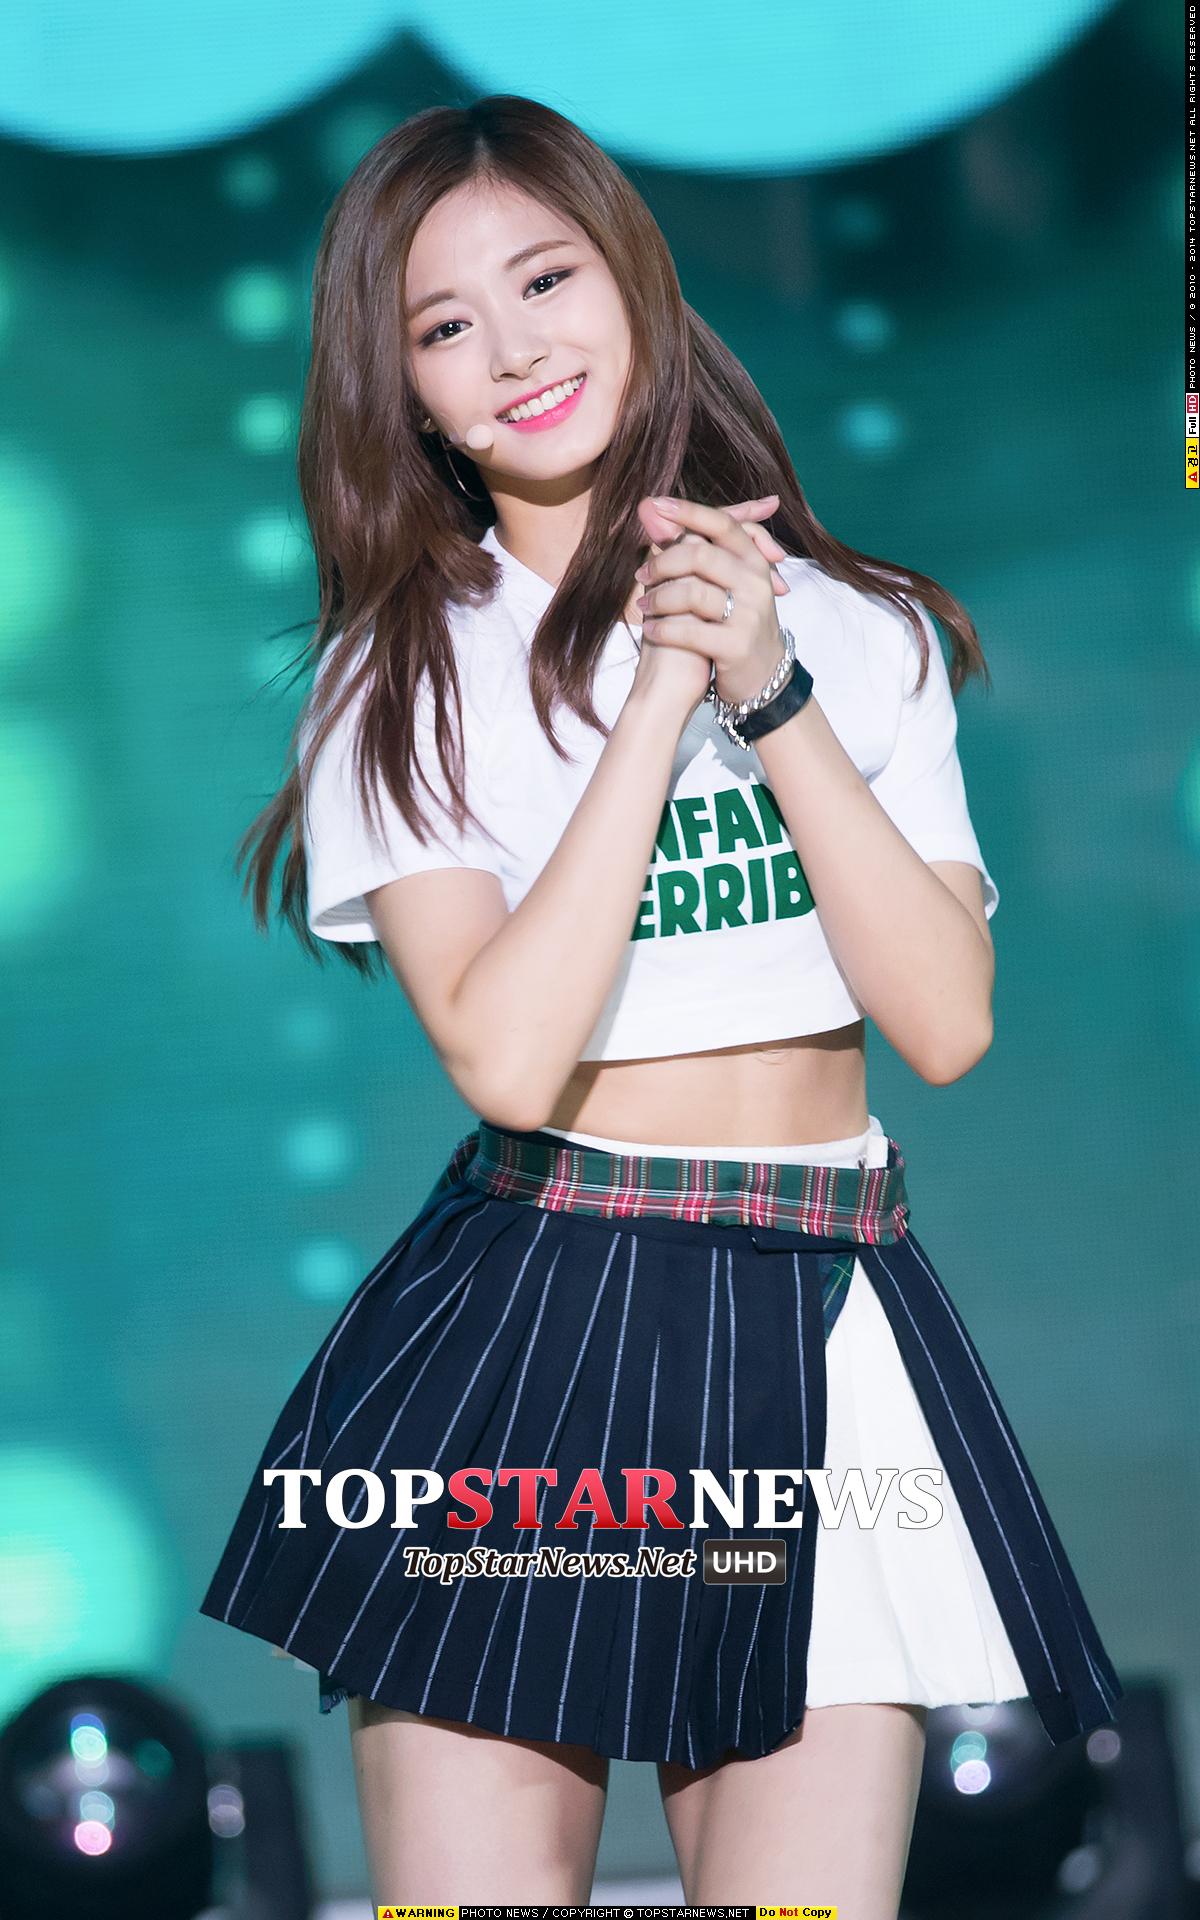 TWICE 子瑜 -她又不是韓國人 -果然不是韓國人 (這評價來鬧的吧)